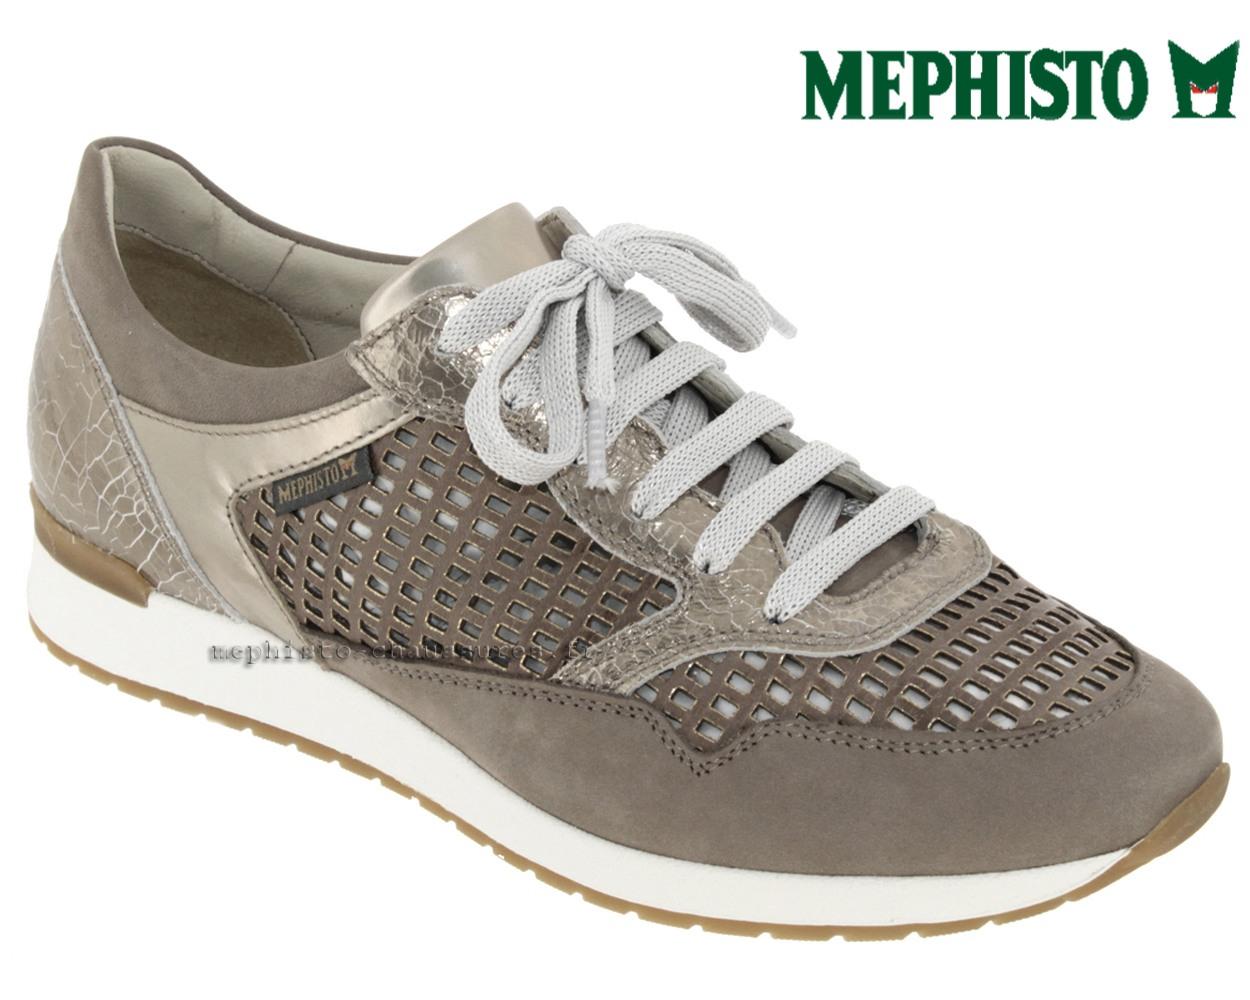 Chaussures Mephisto bleues femme PLqjY7VT5